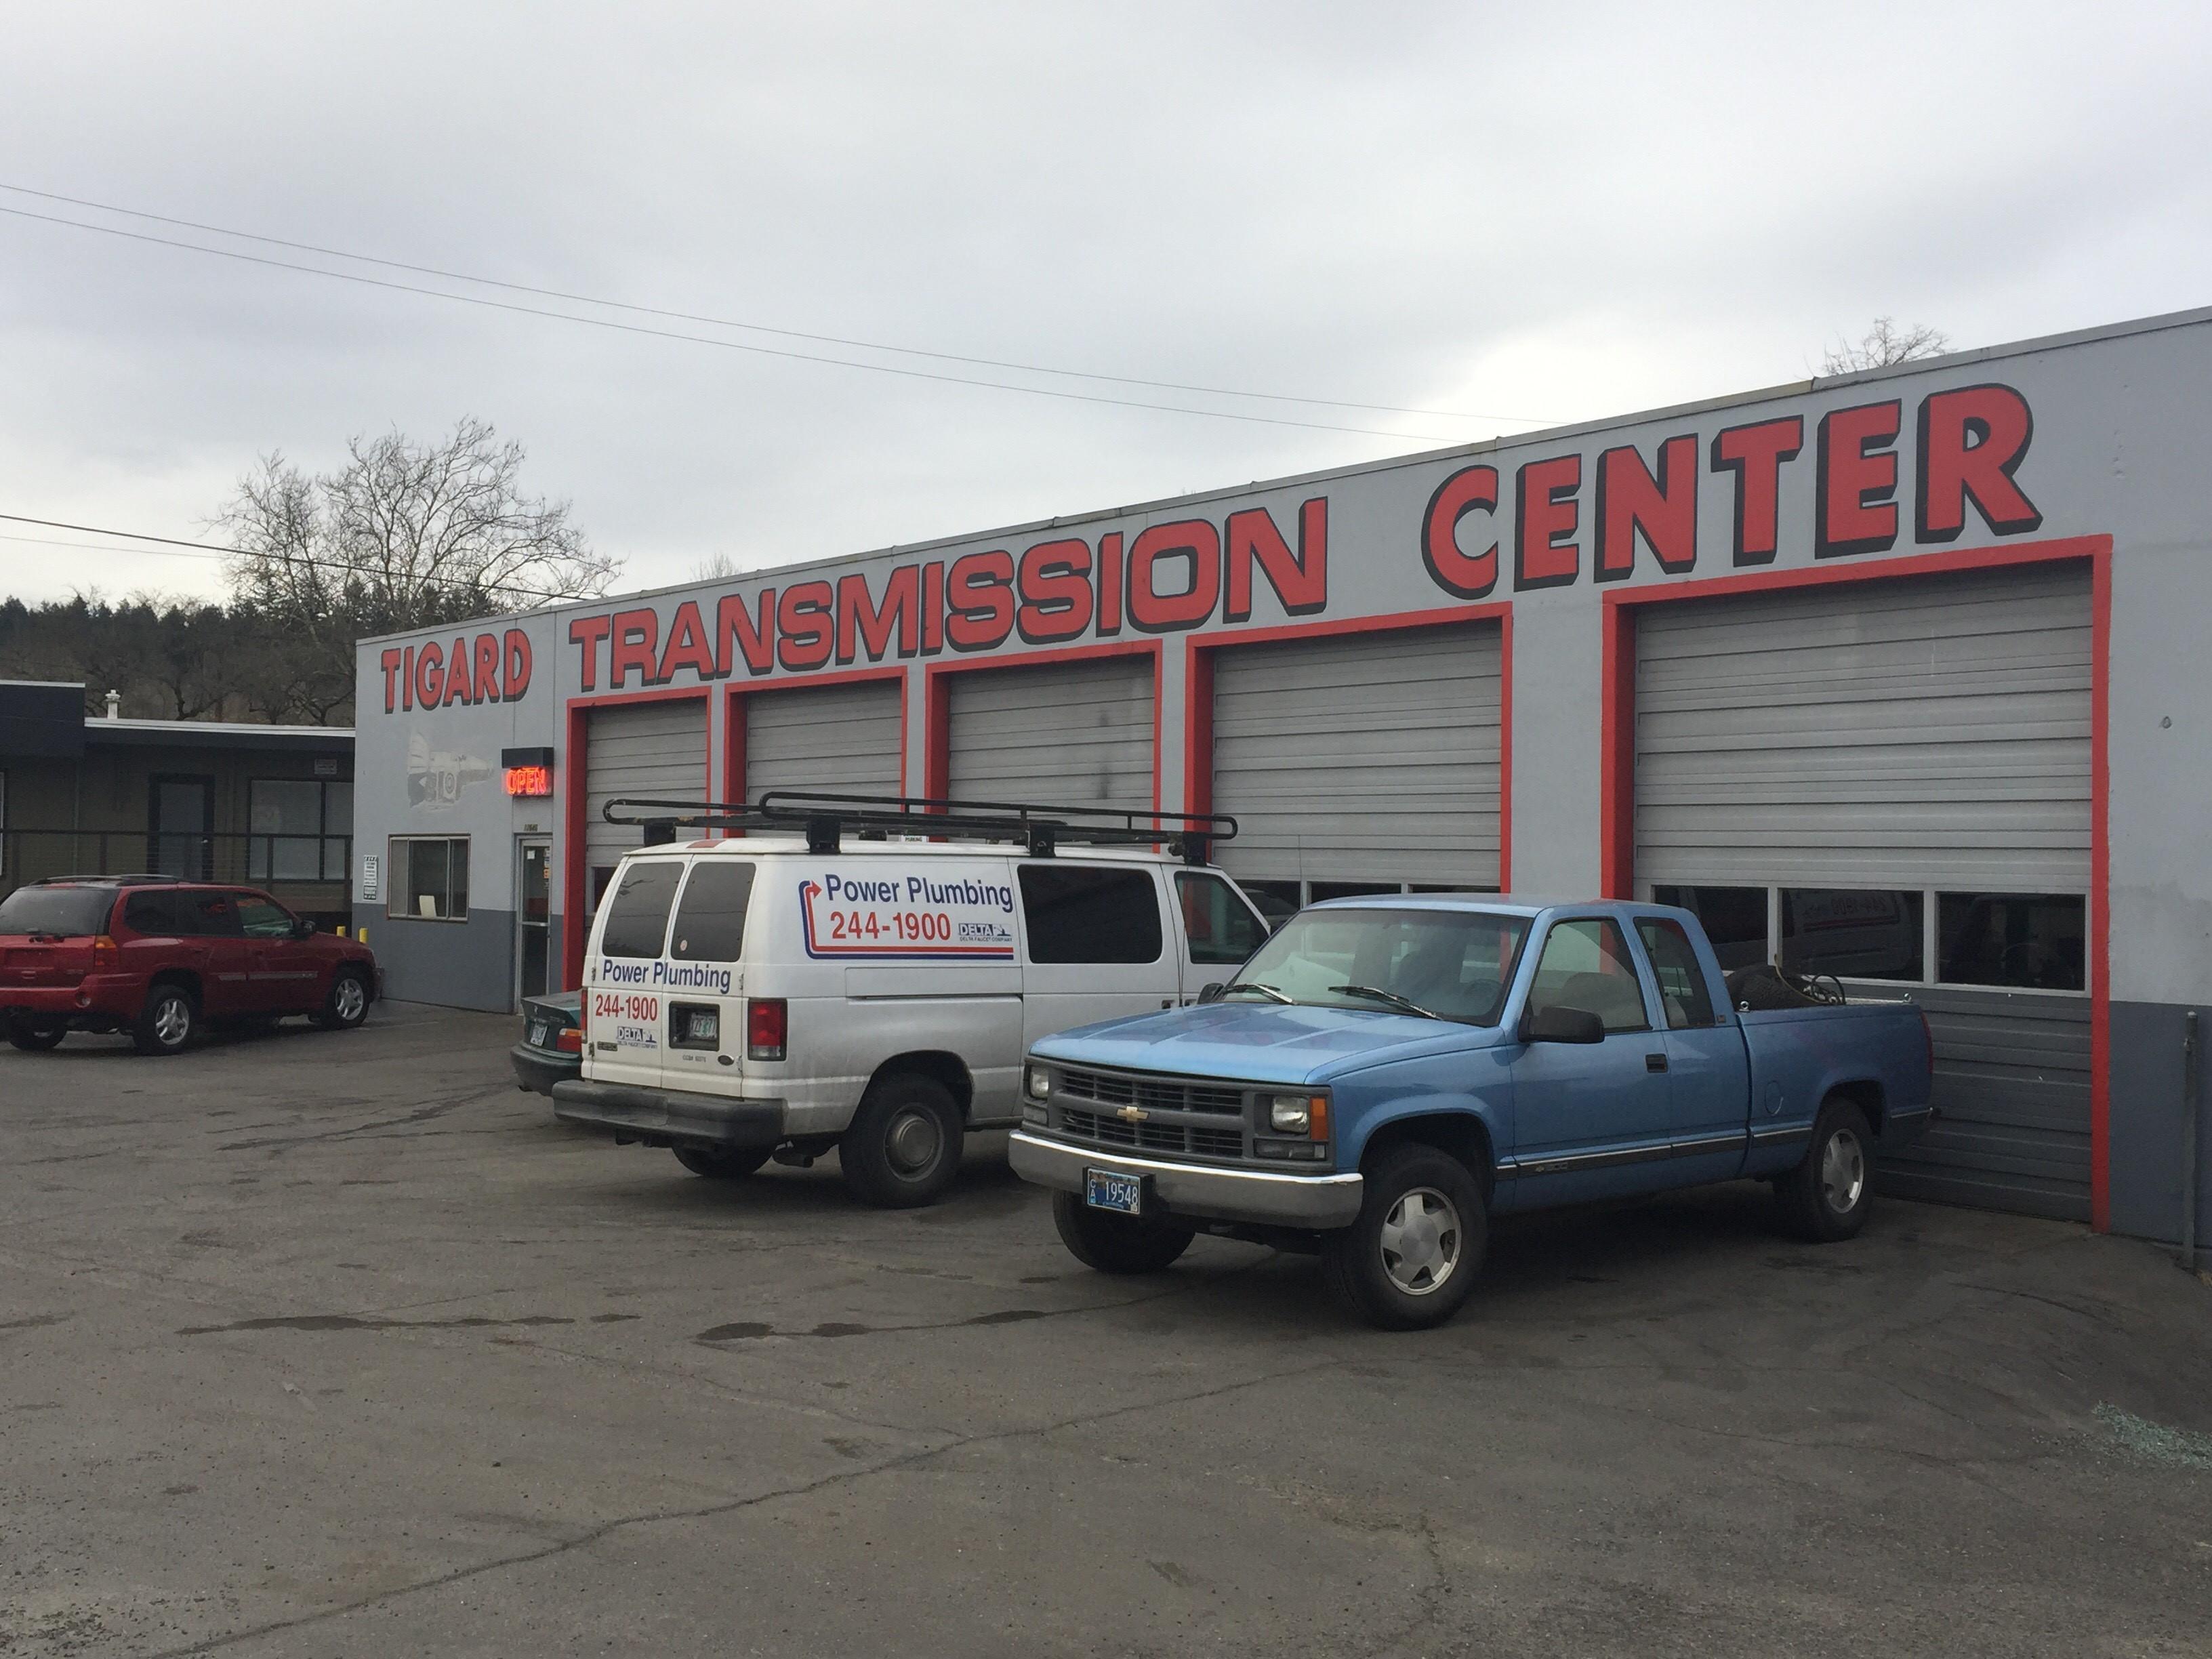 Tigard Transmission Center image 5